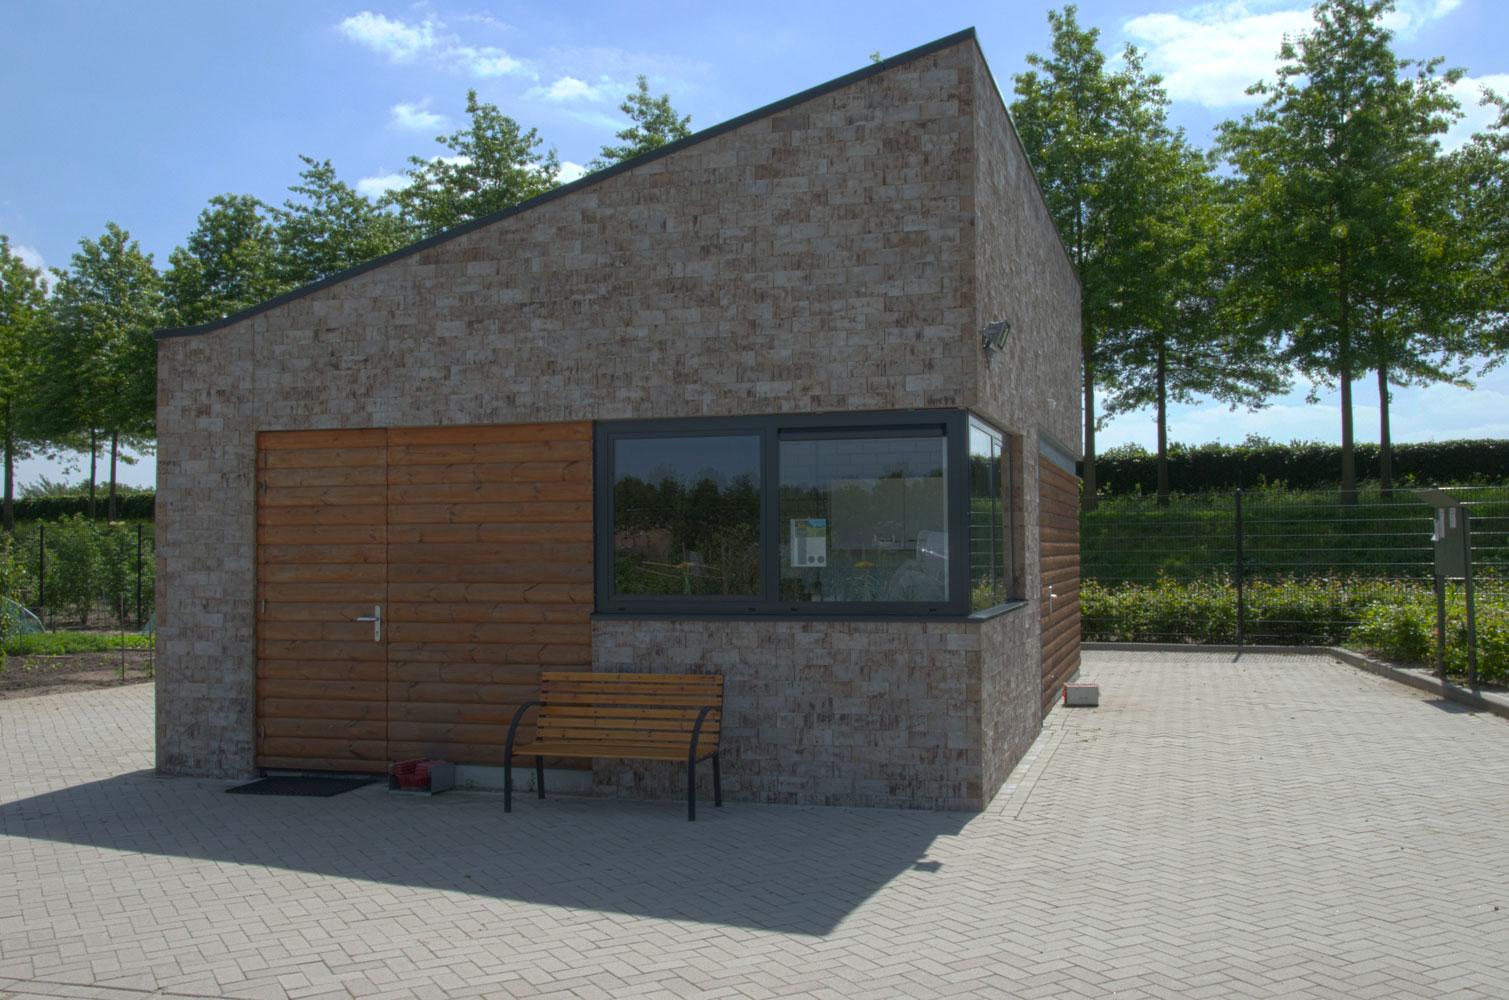 00712ext3 Volkstuinencomplex Etten-Leur